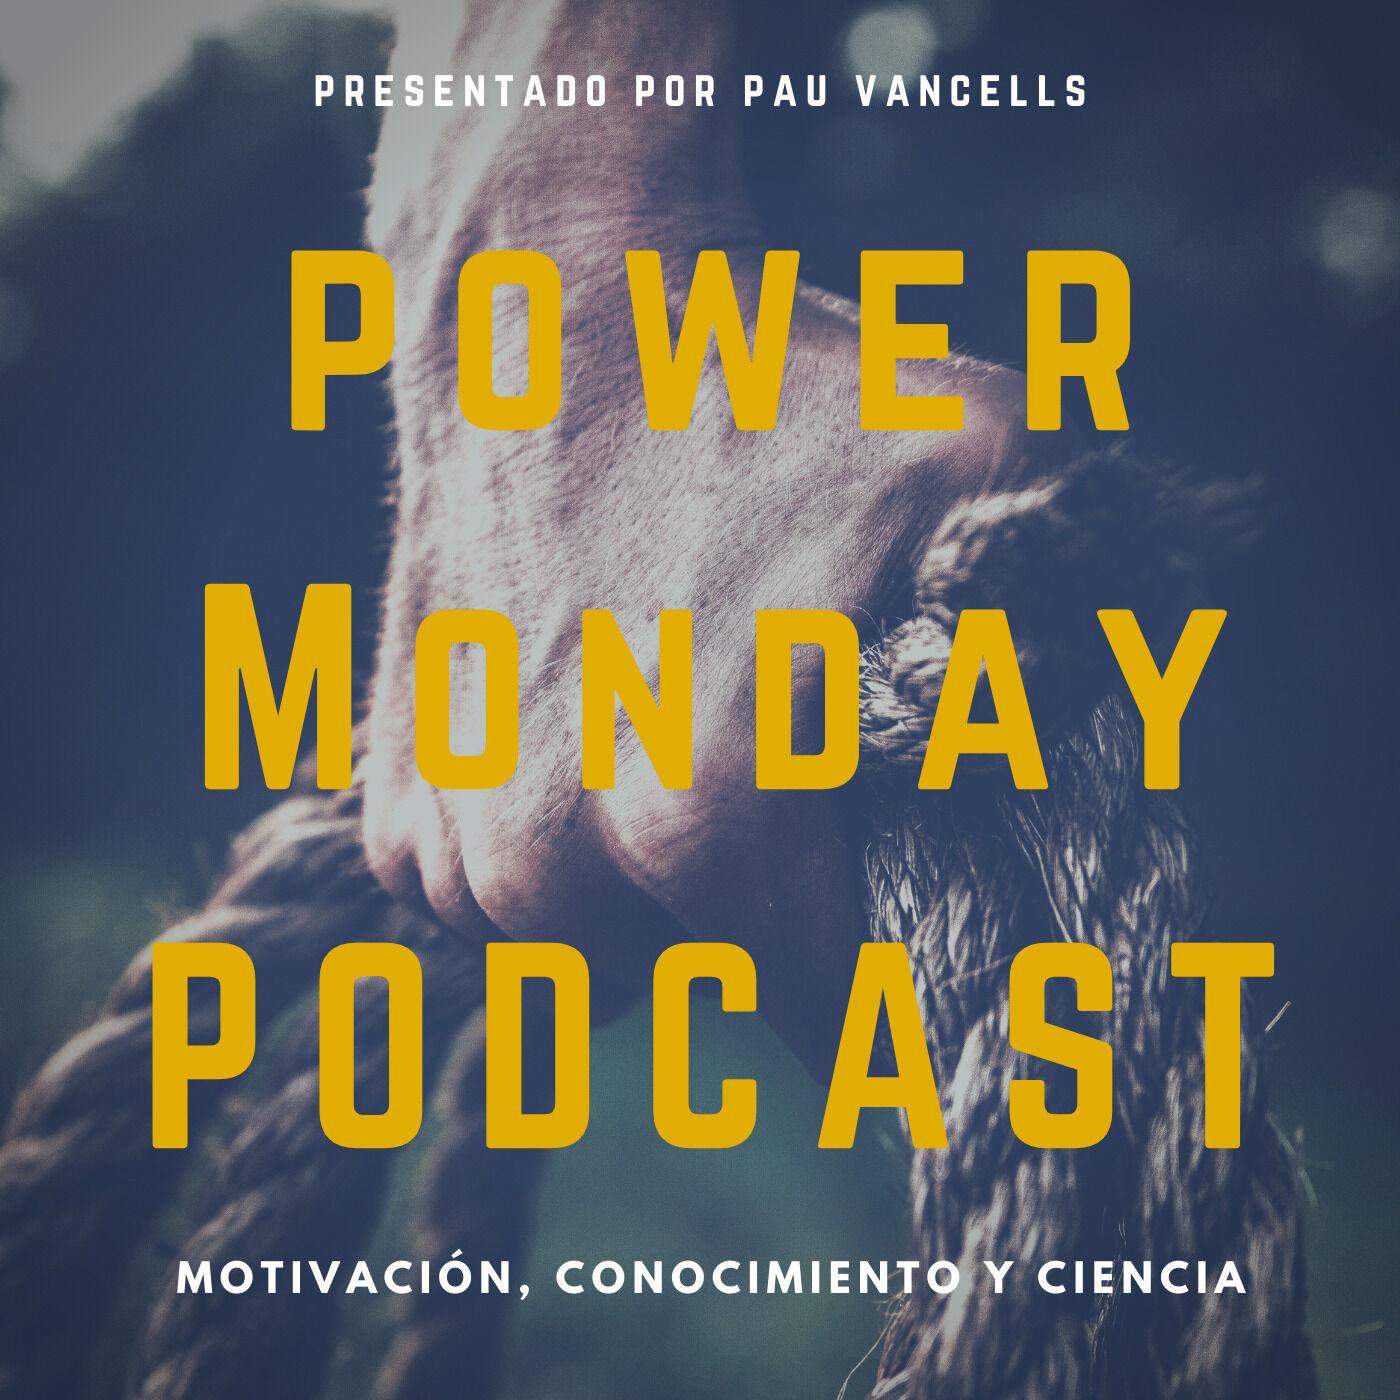 Power Monday Podcast